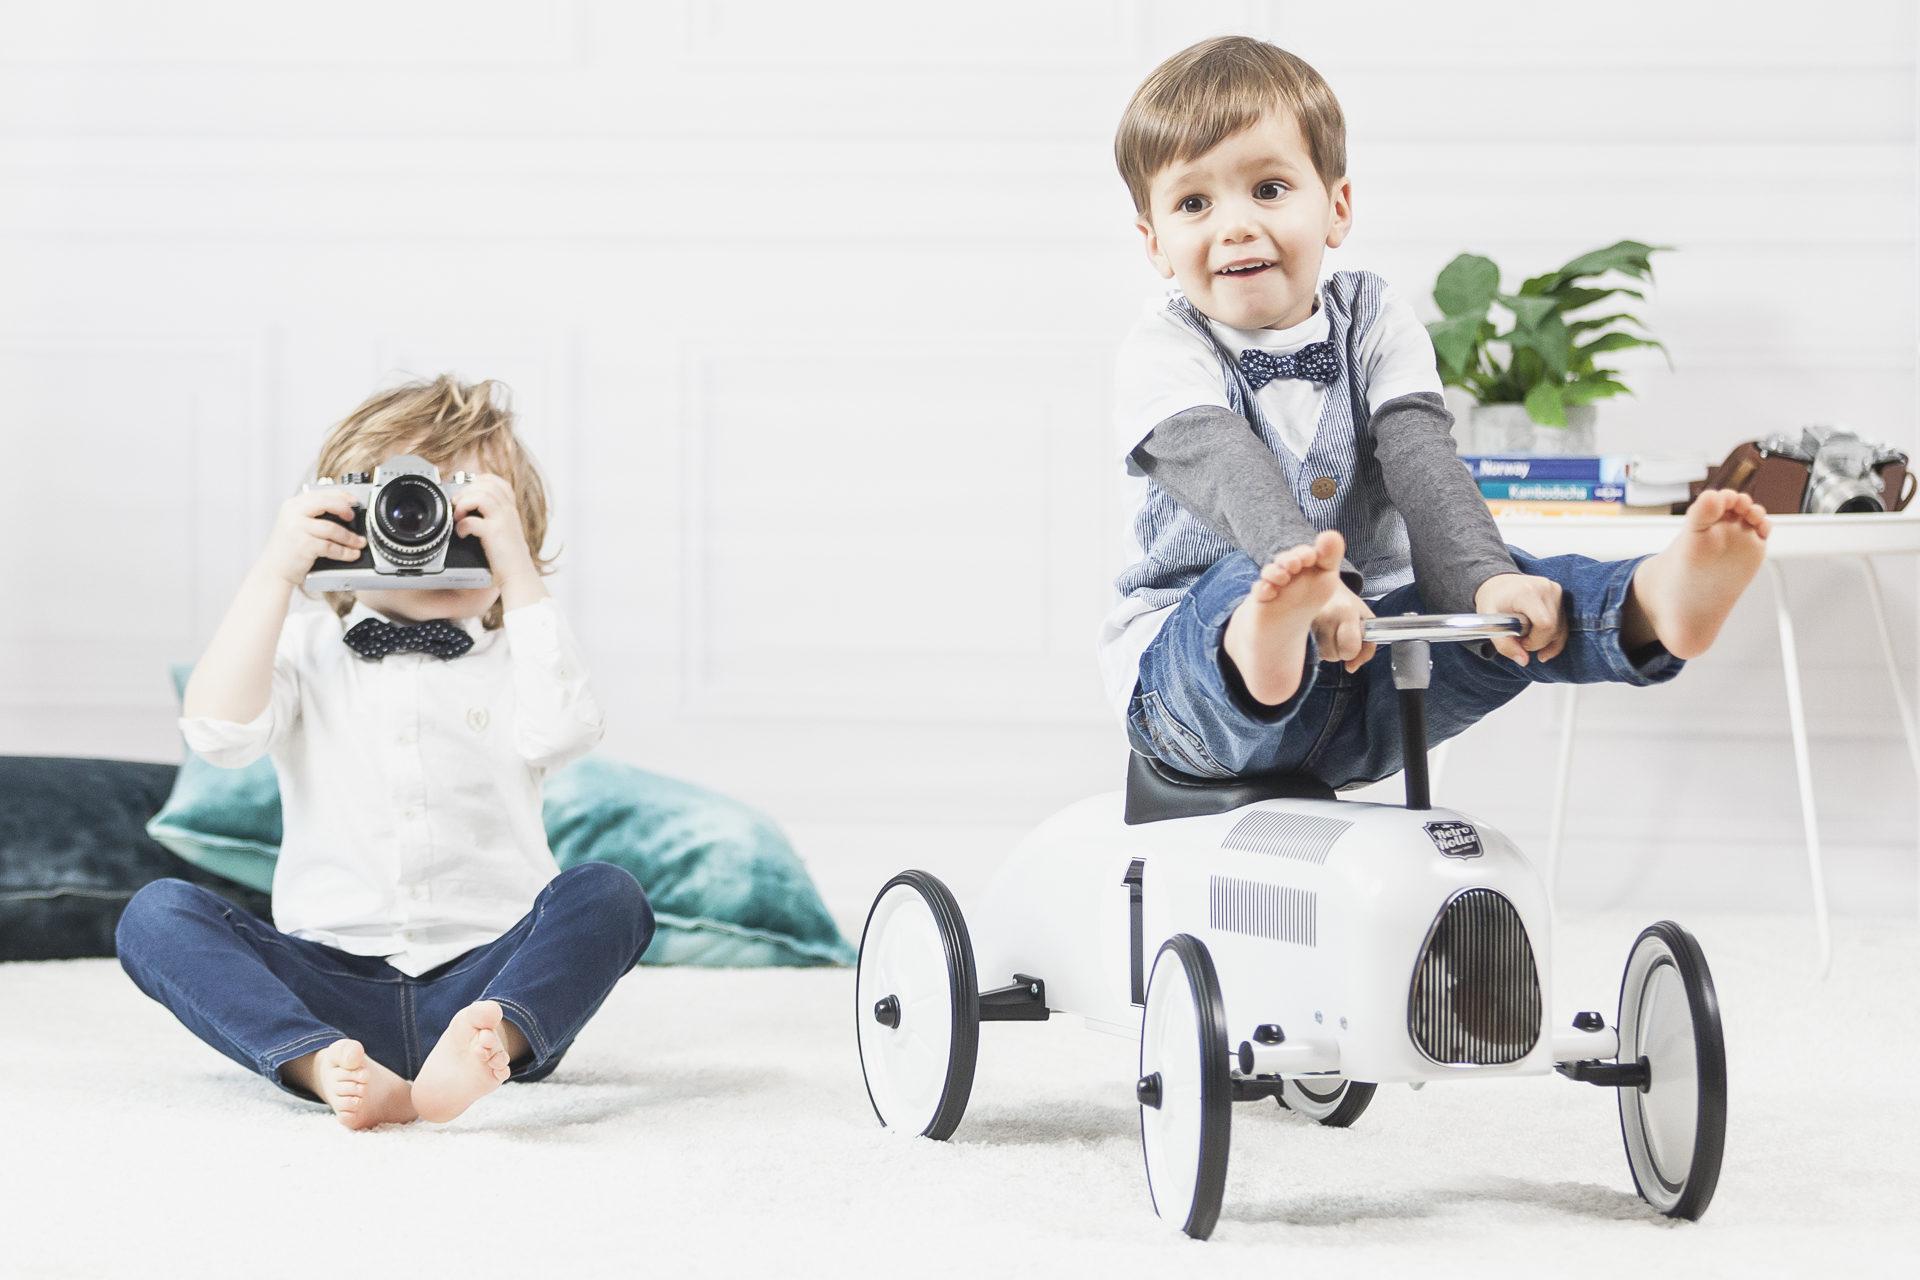 galerie-littlephotographers-01-kindergartenfotografie